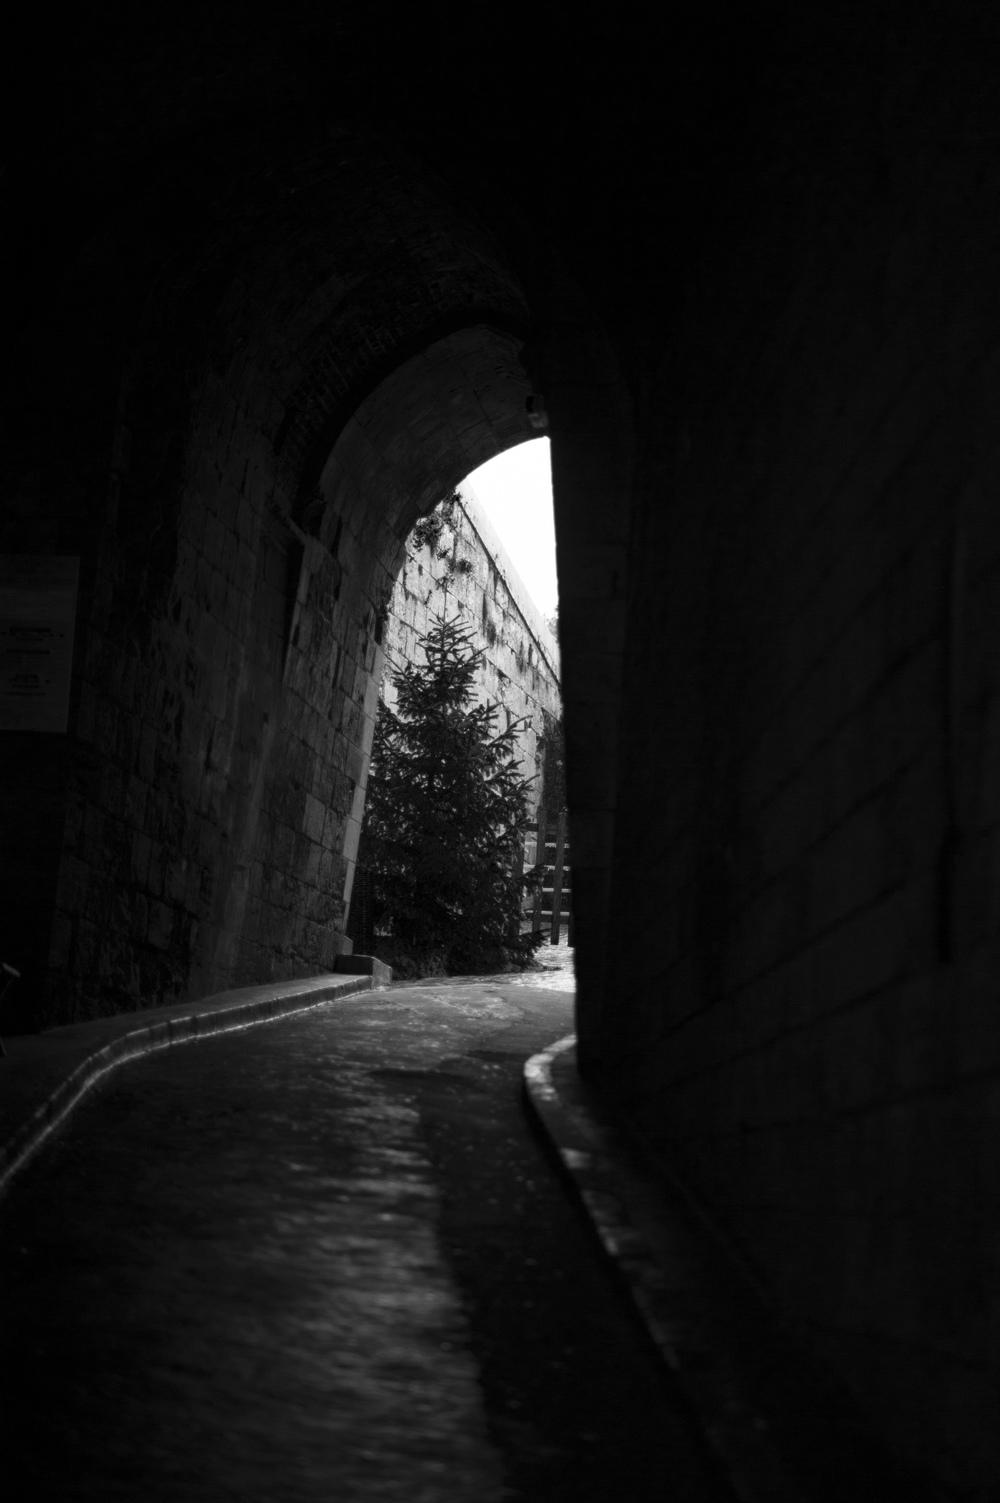 amboisetunnel.jpg